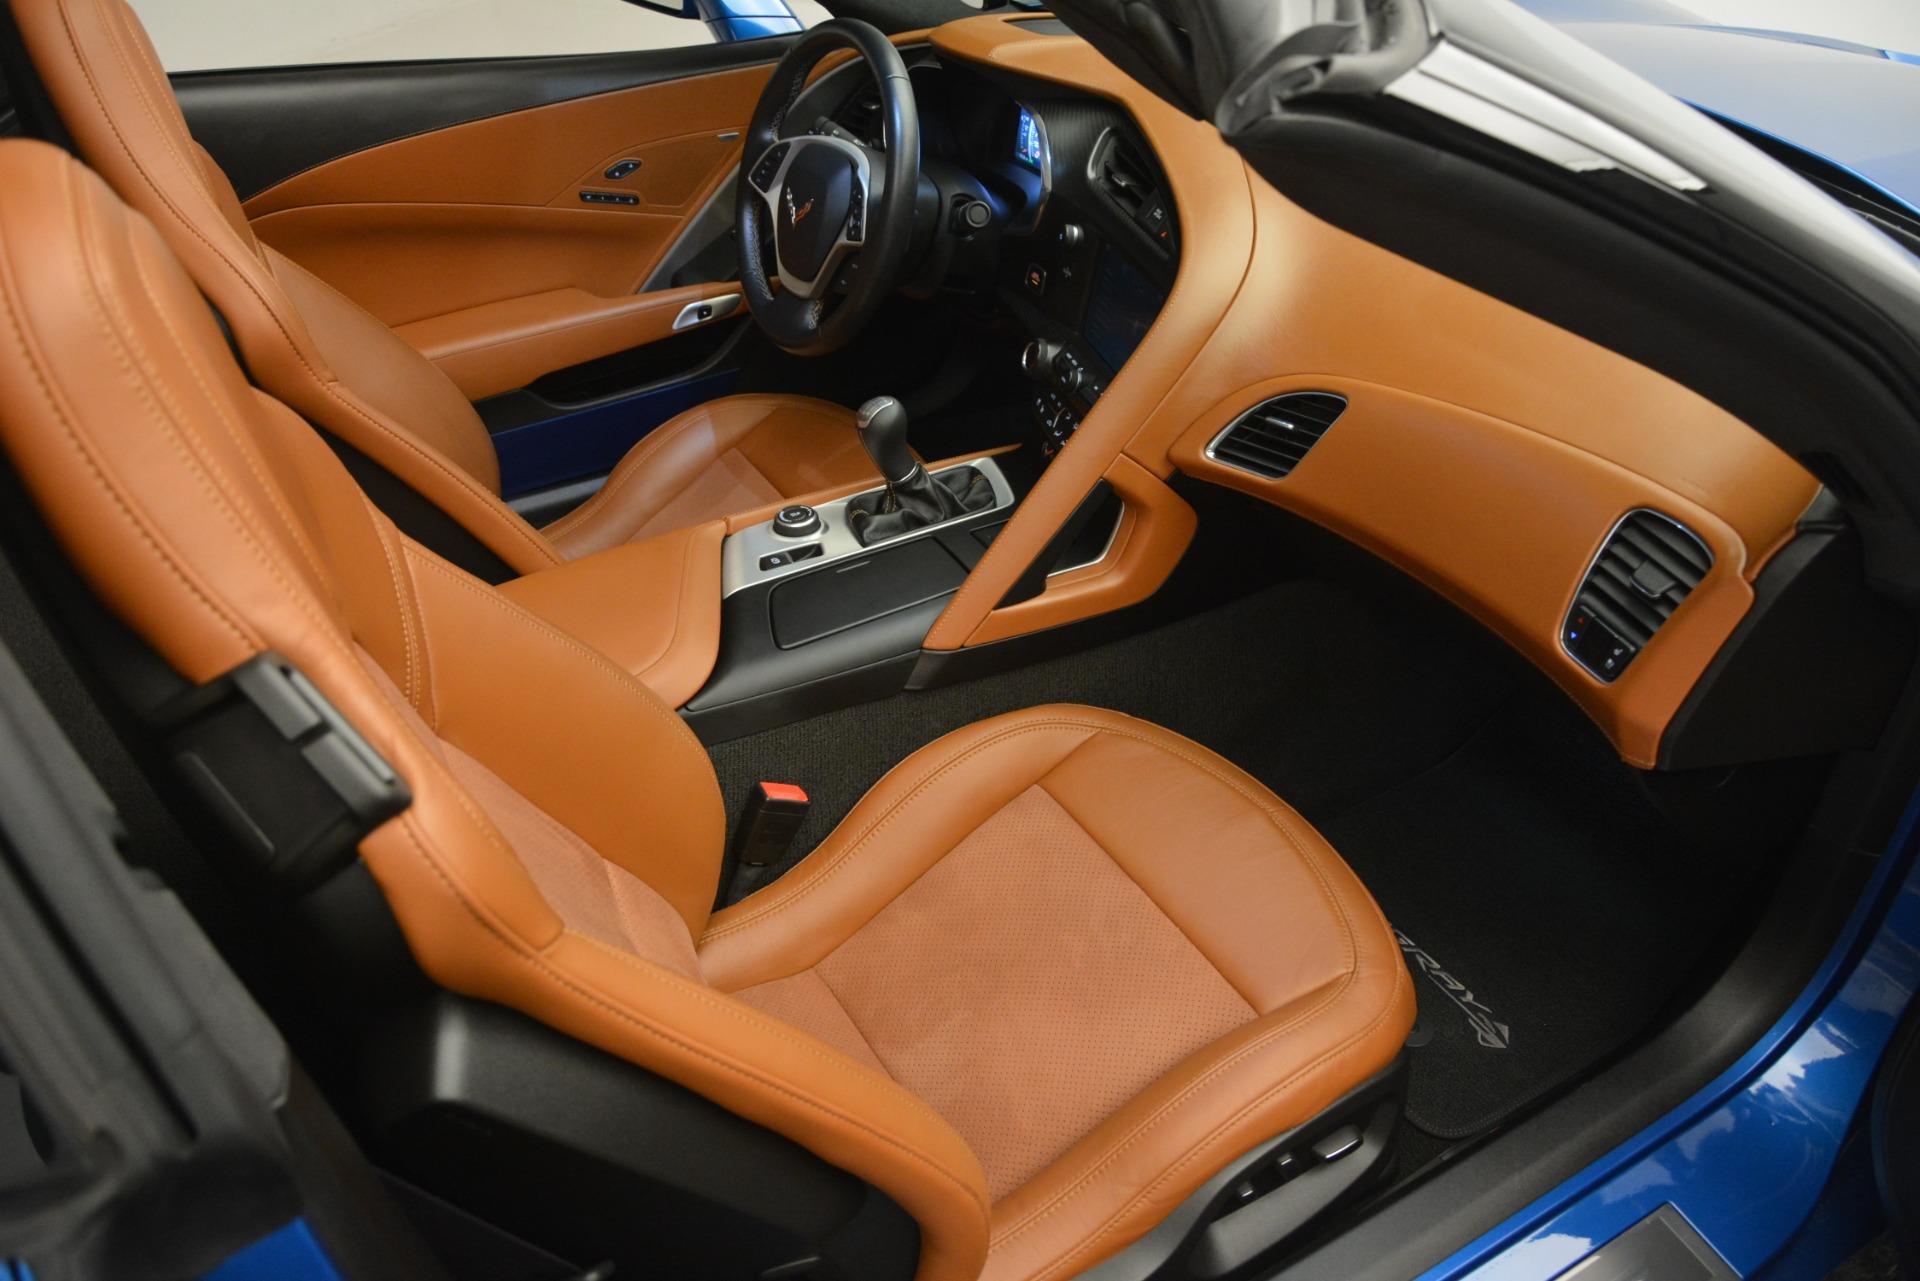 Used 2014 Chevrolet Corvette Stingray Z51 For Sale In Greenwich, CT 2703_p25